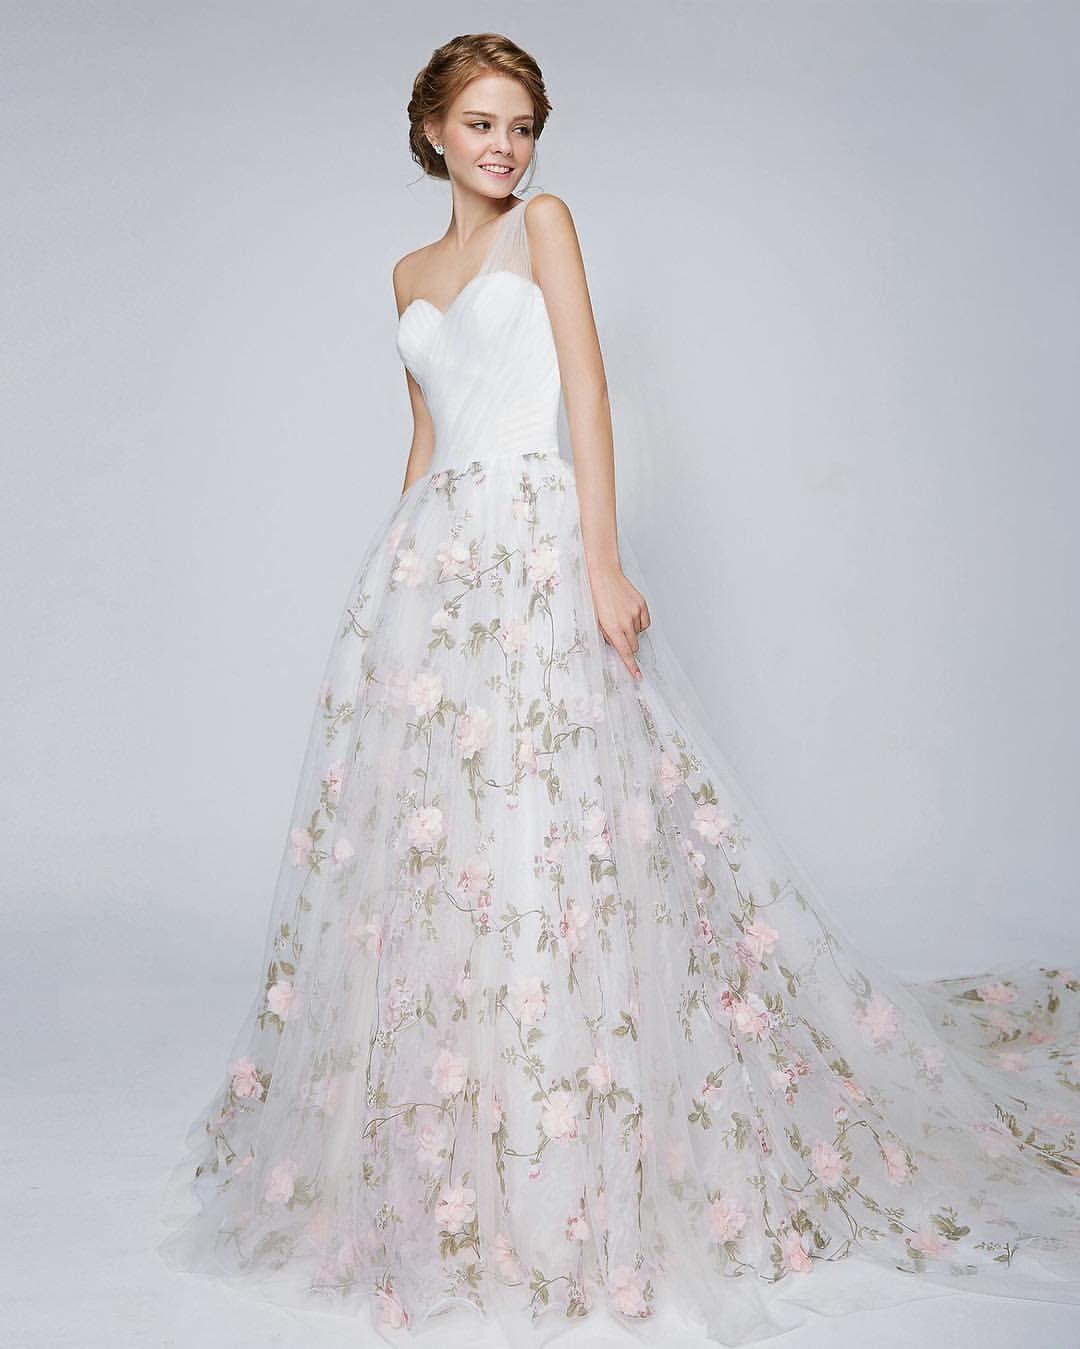 Floral Wedding Dress: Pin By Cindy Wallin Barcomb On Wedding In 2019